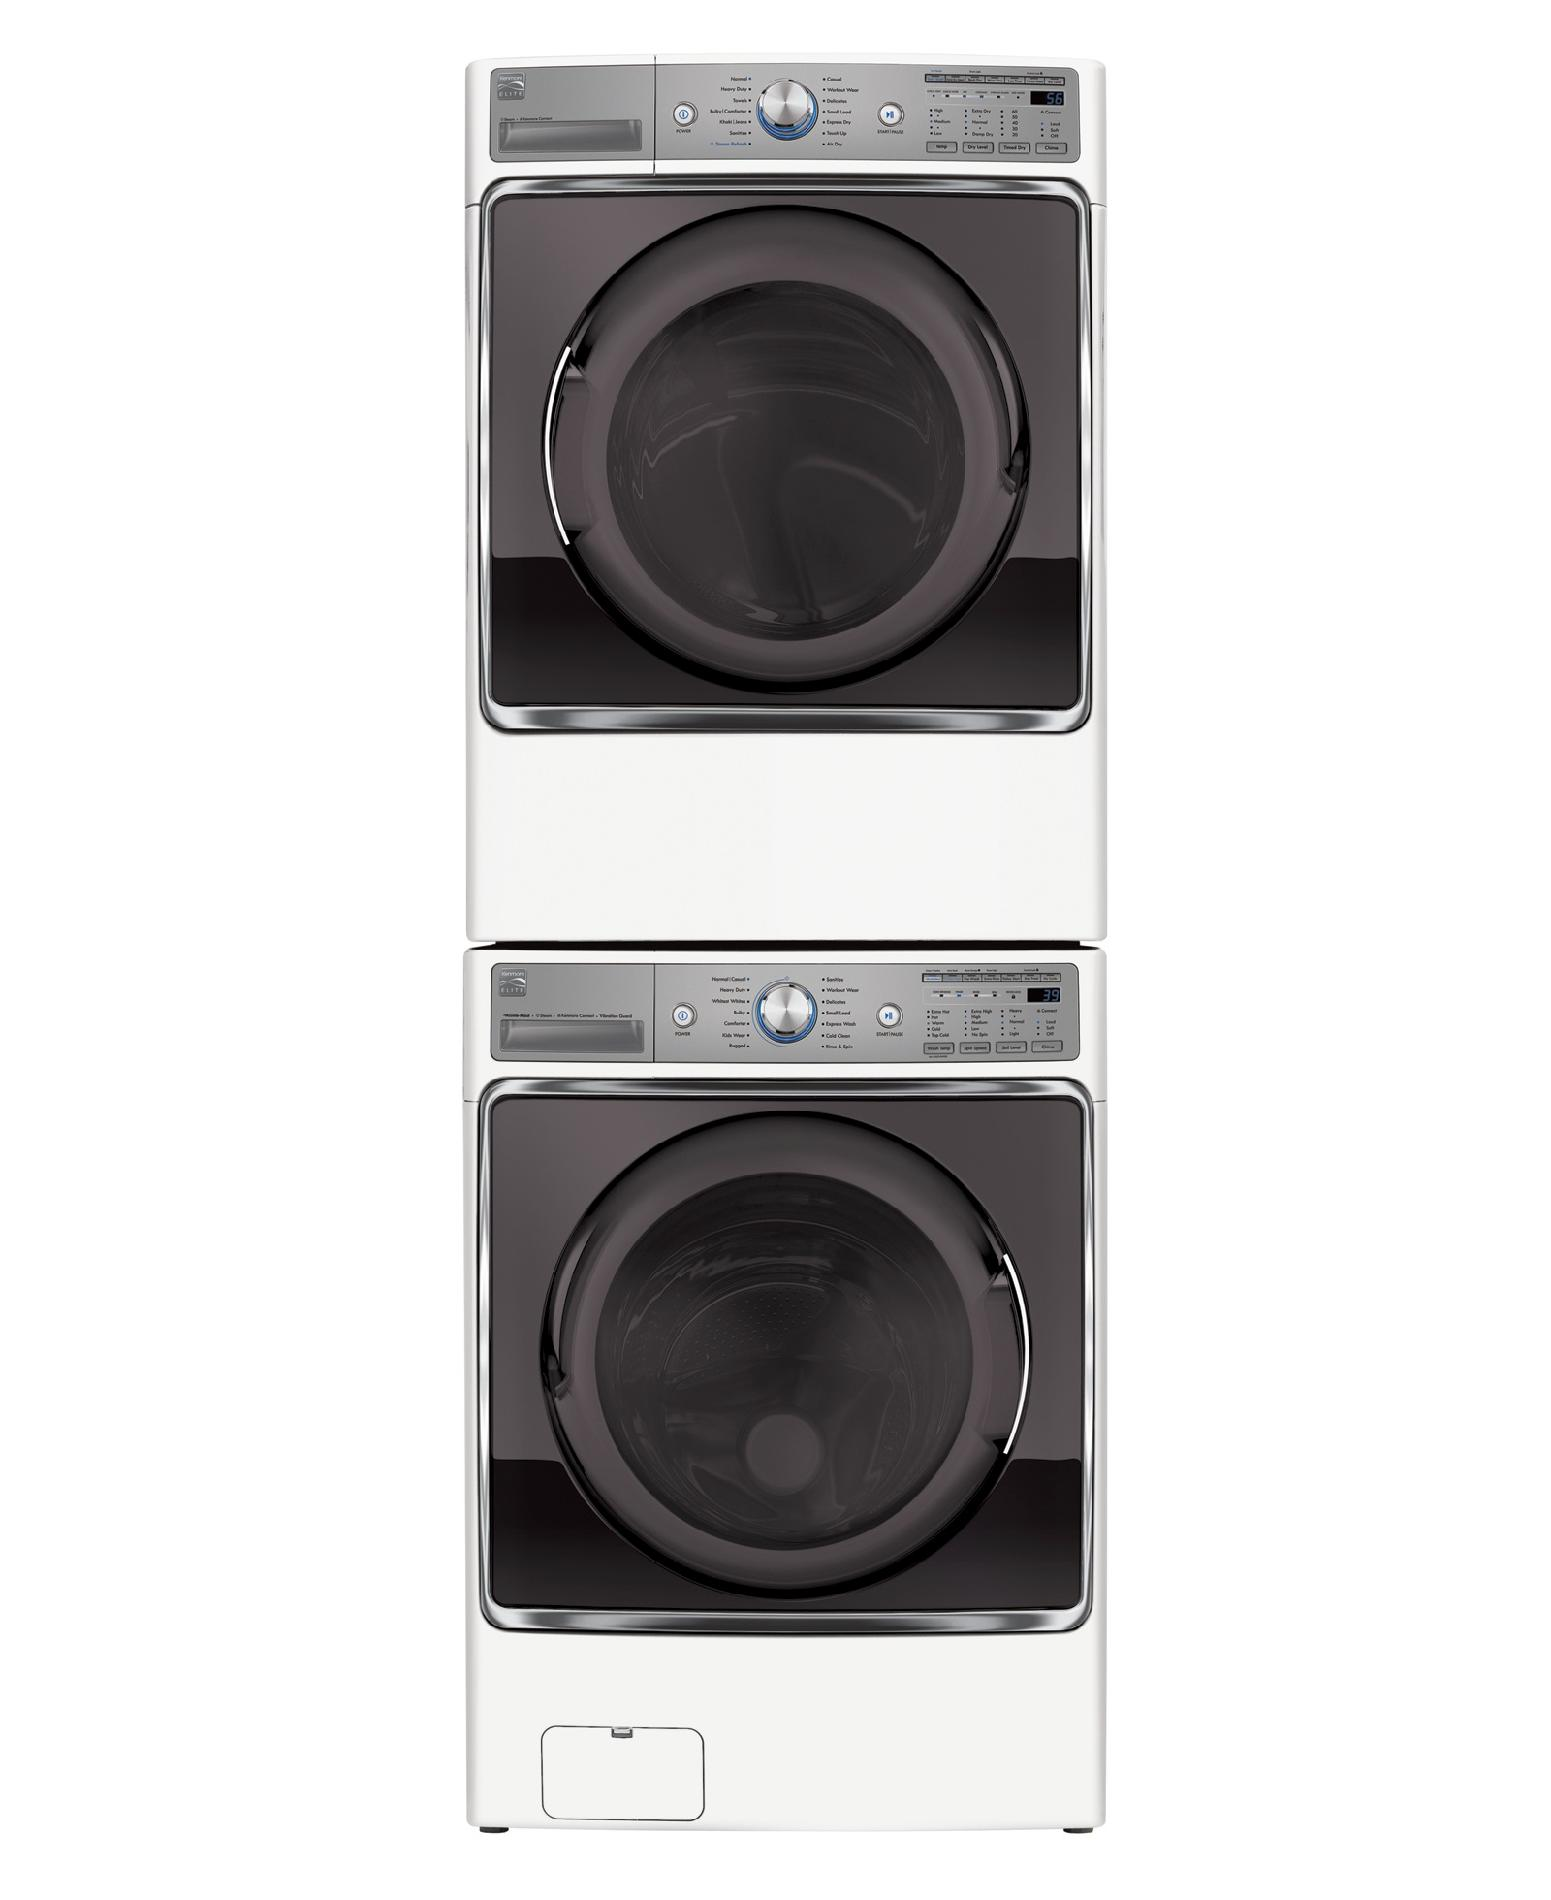 Kenmore Elite 91072 9.0 cu. ft. Gas Dryer - White